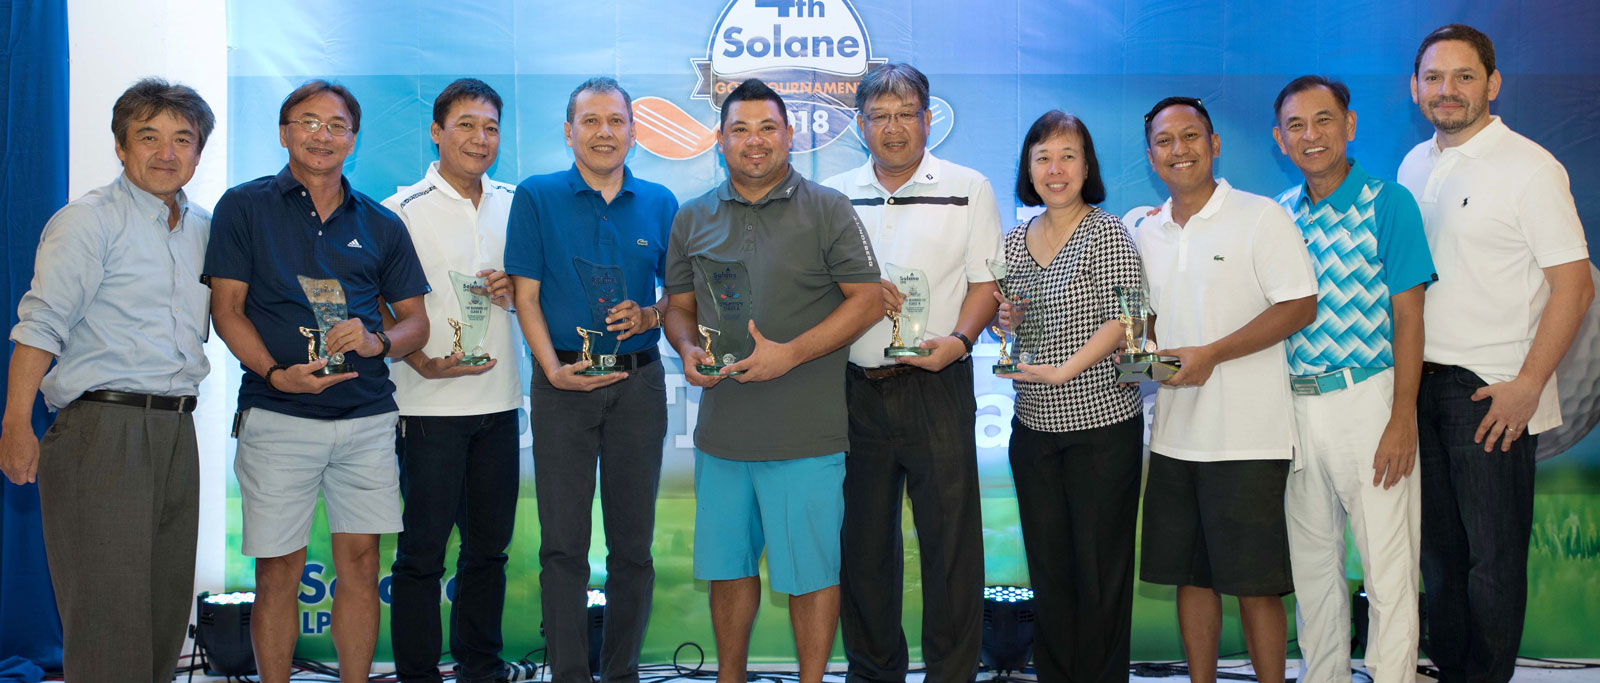 Solane hosts 4th golf cup tournament